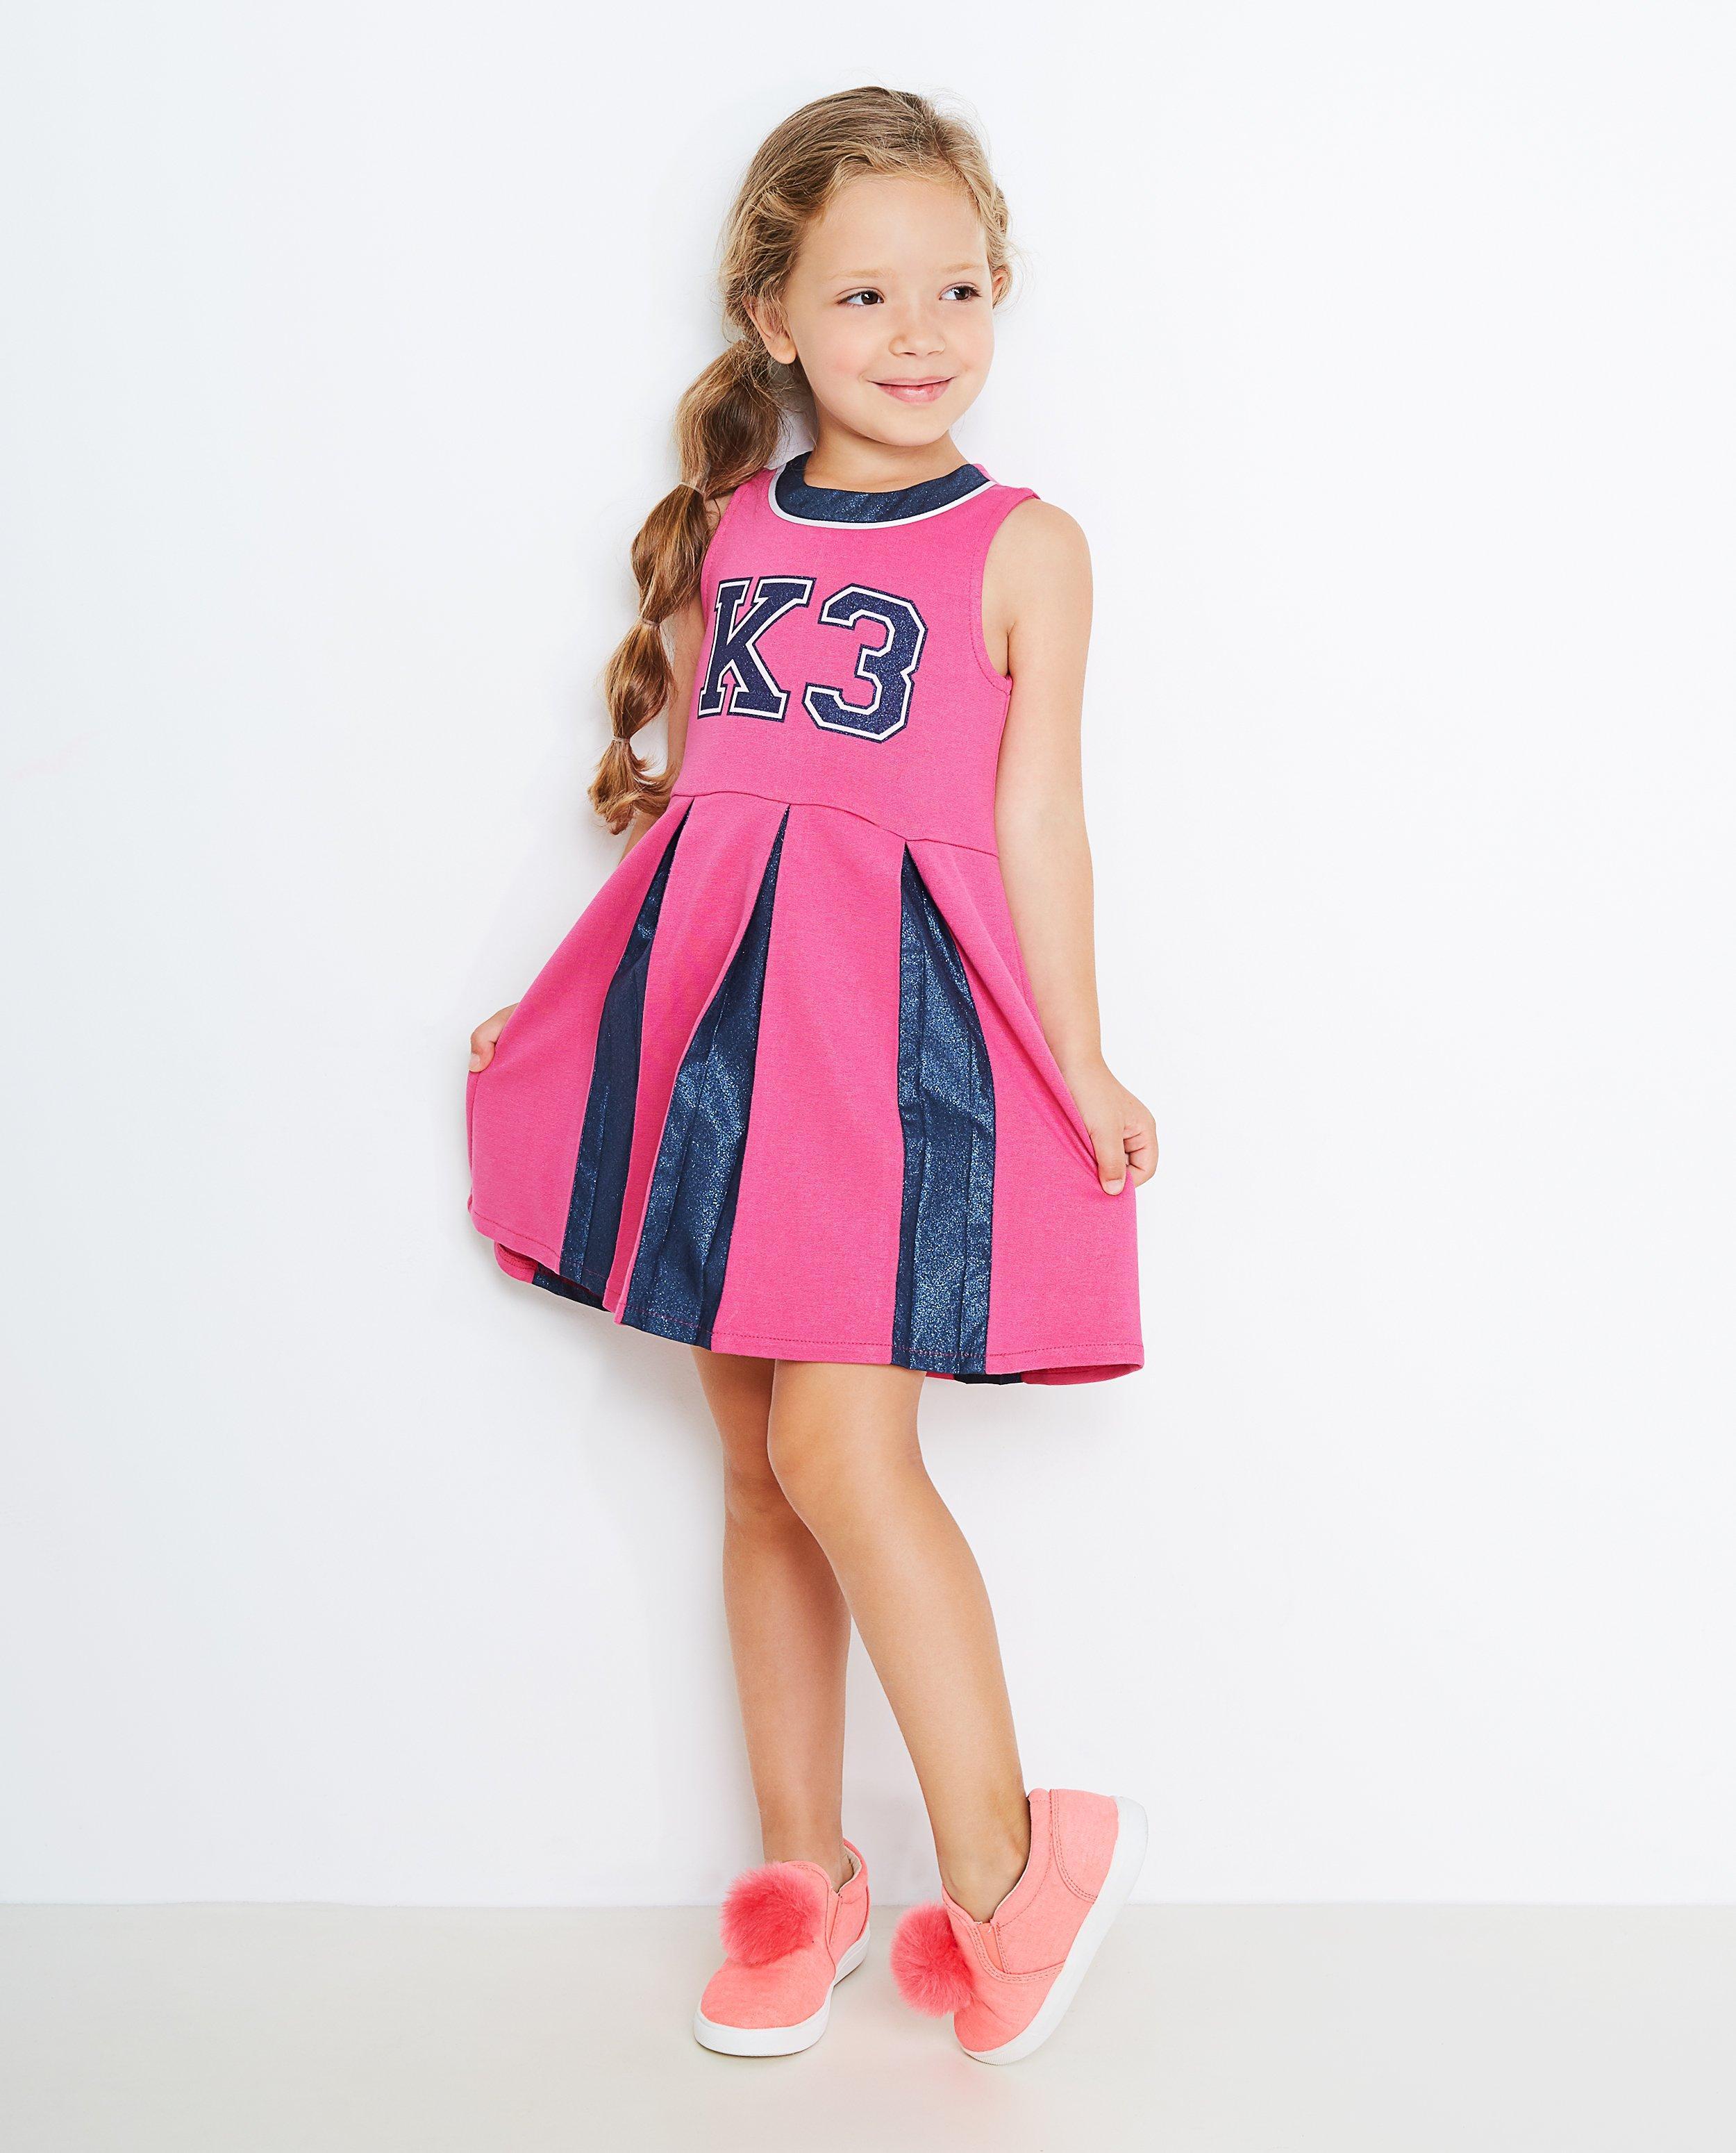 kleedjes van k3